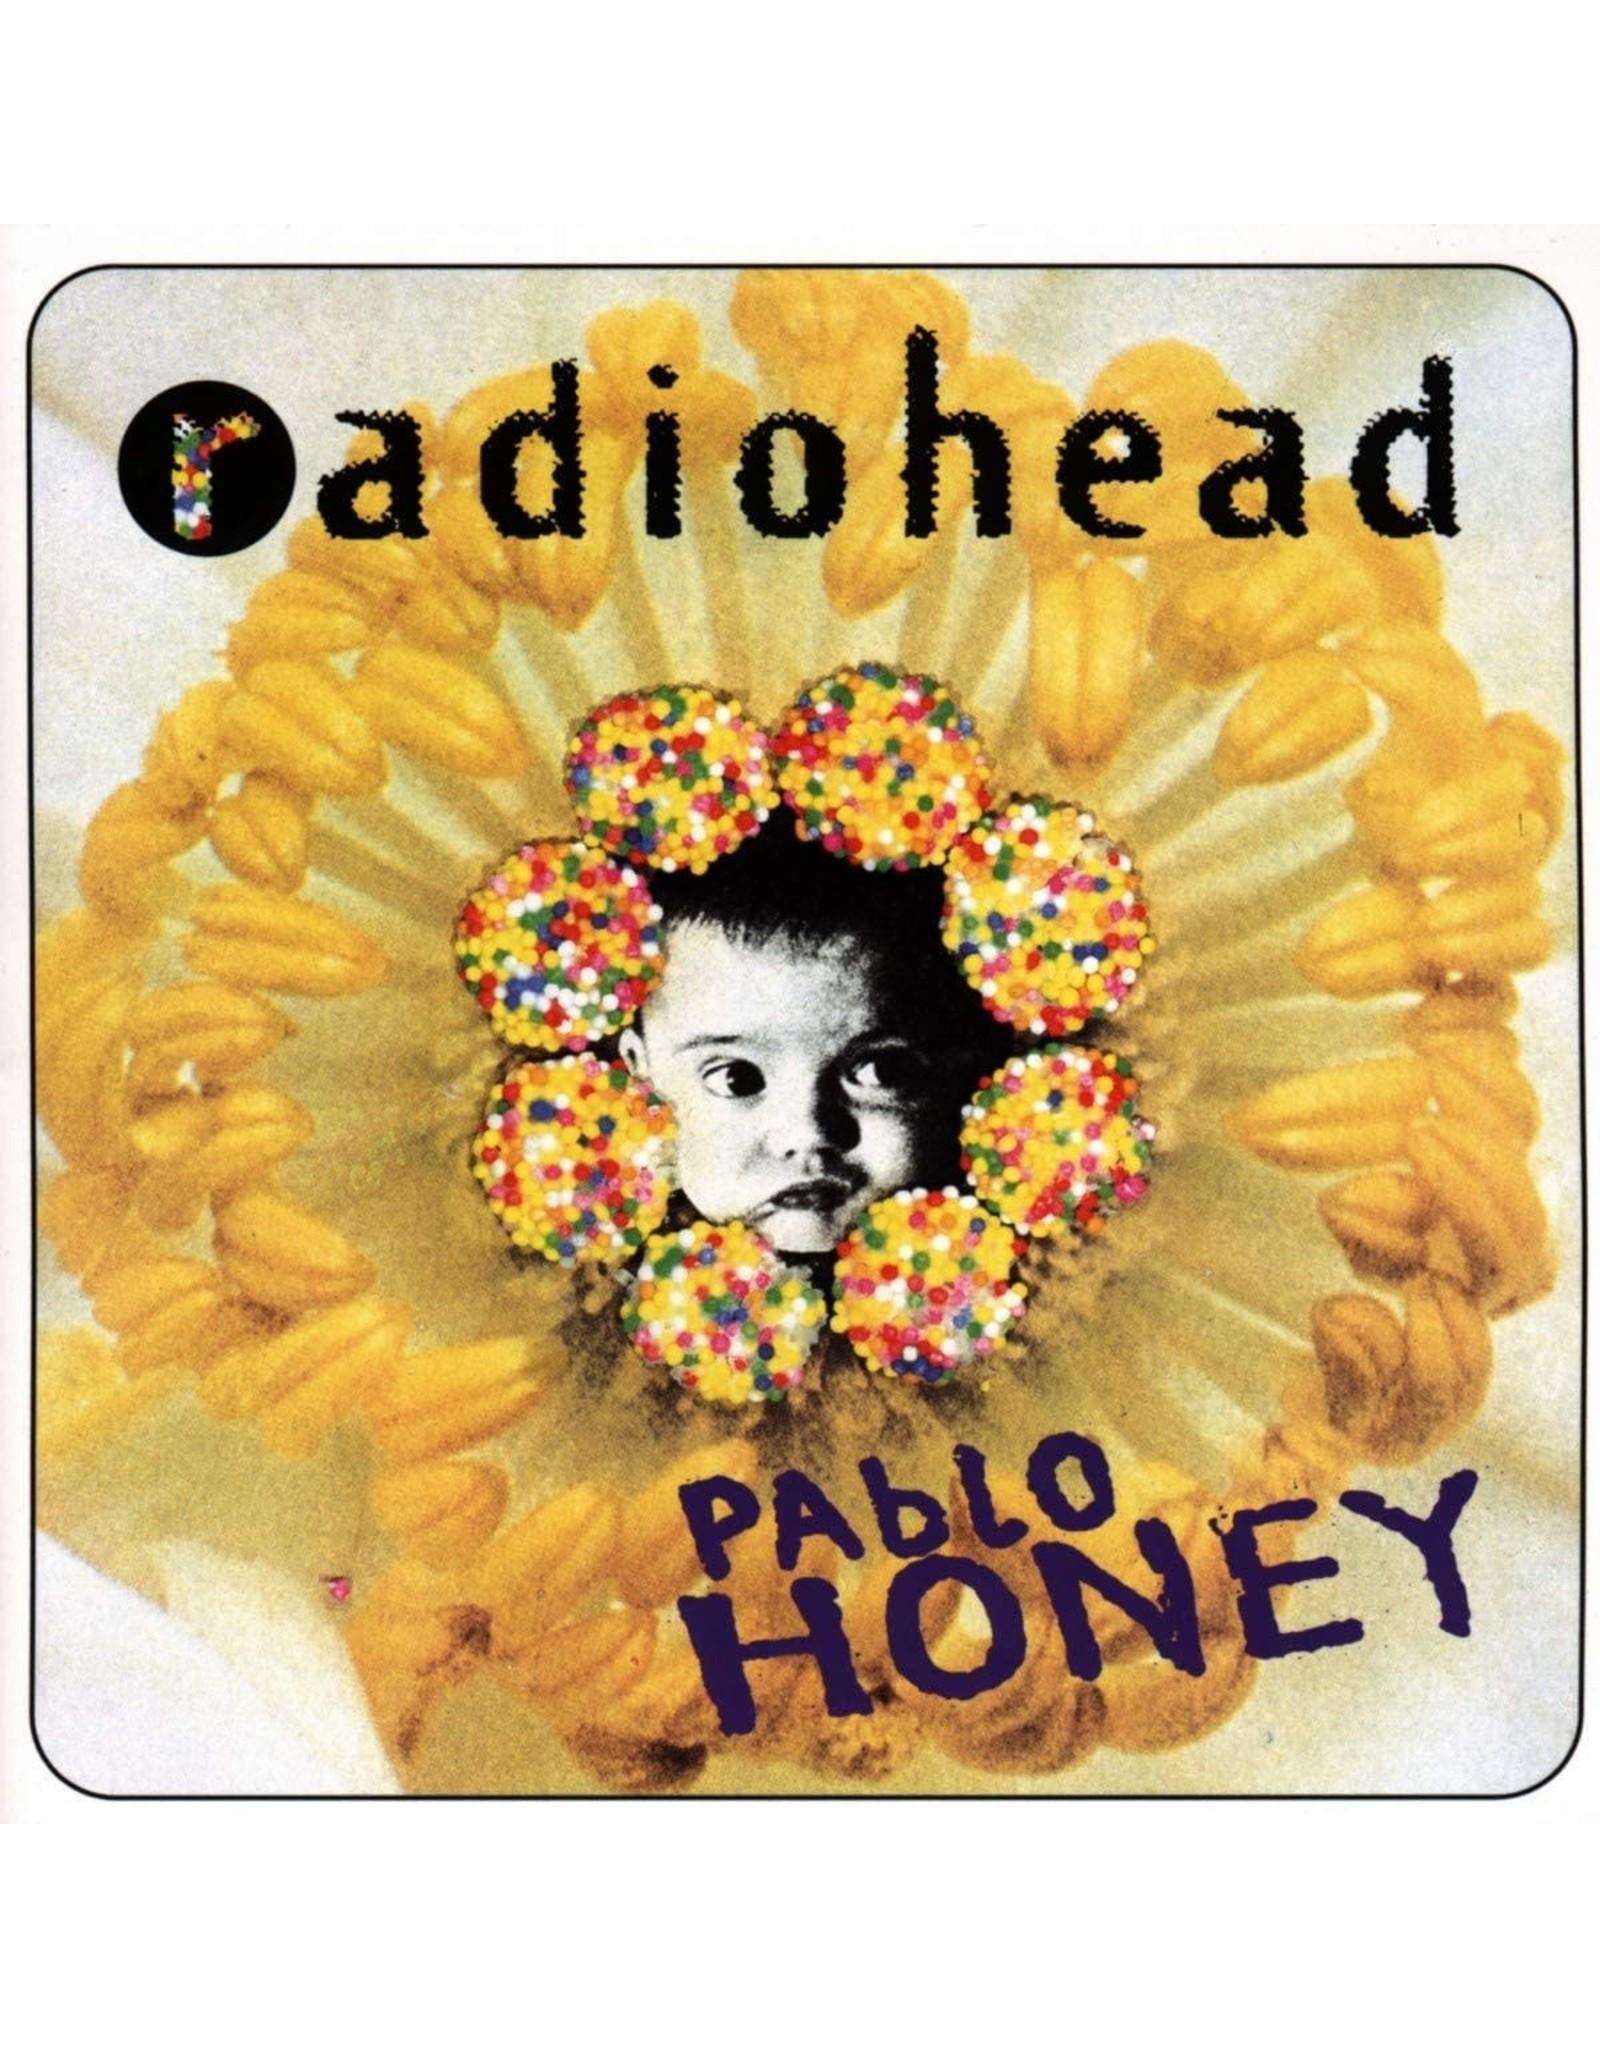 Radiohead - Pablo Honey LP